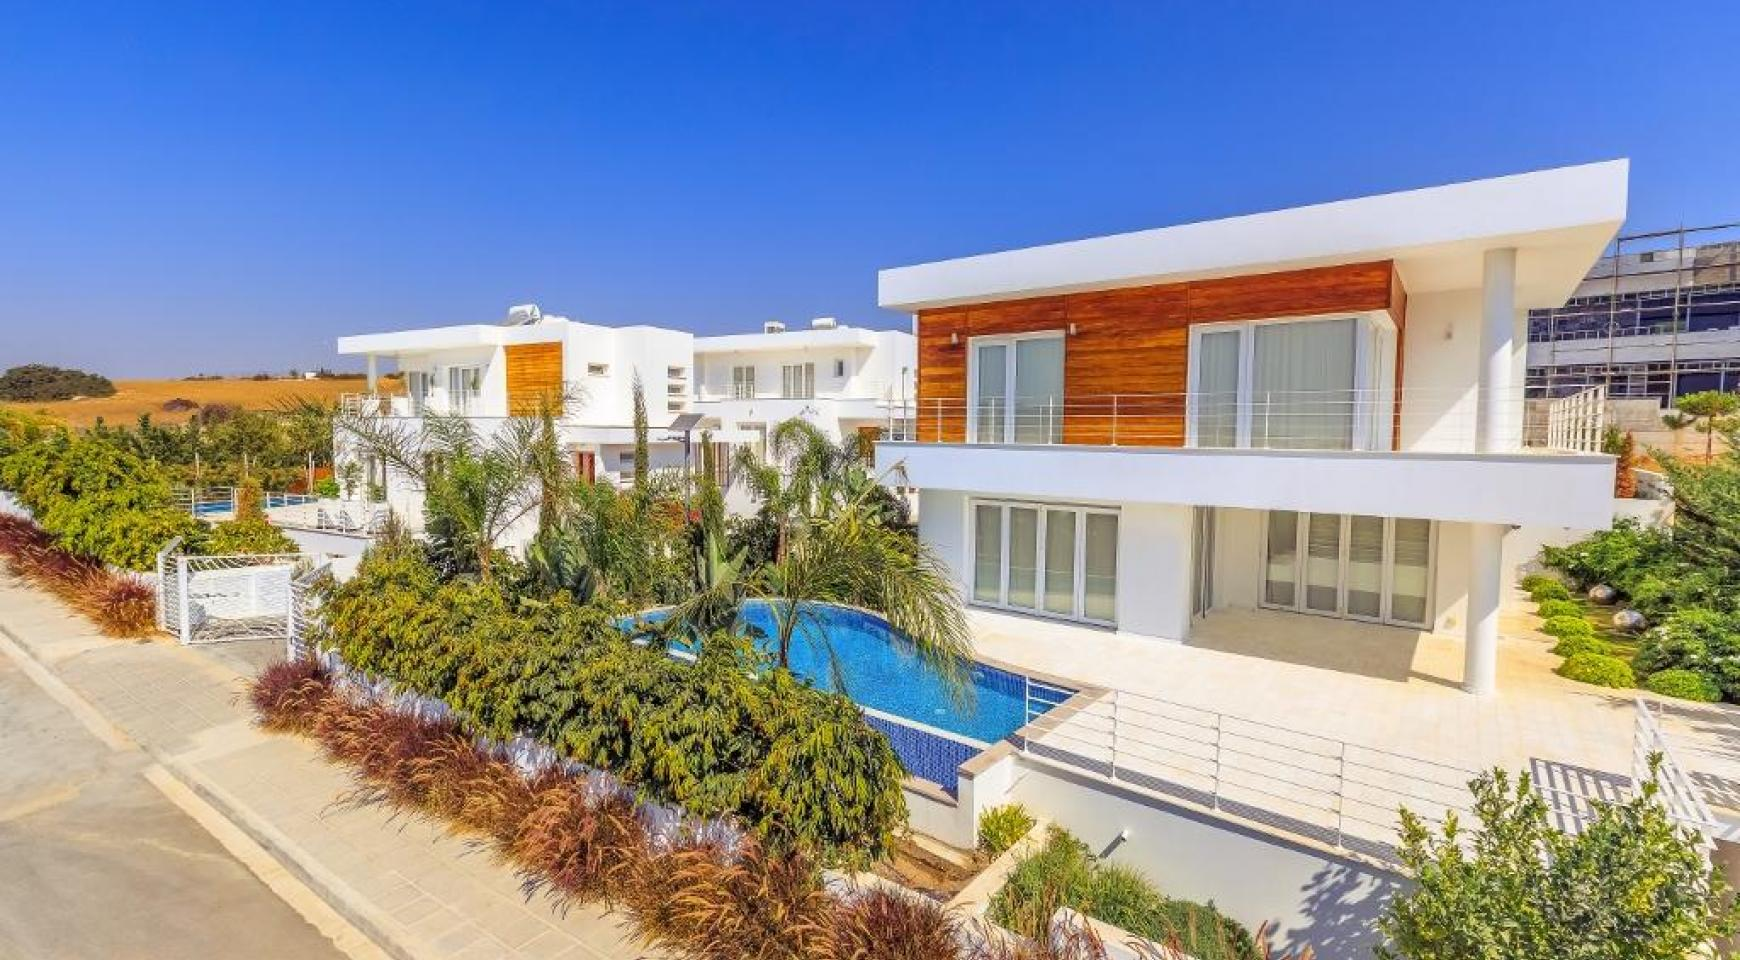 4-Спальная Вилла с Видом на Море в Районе Agios Tychonas - 3